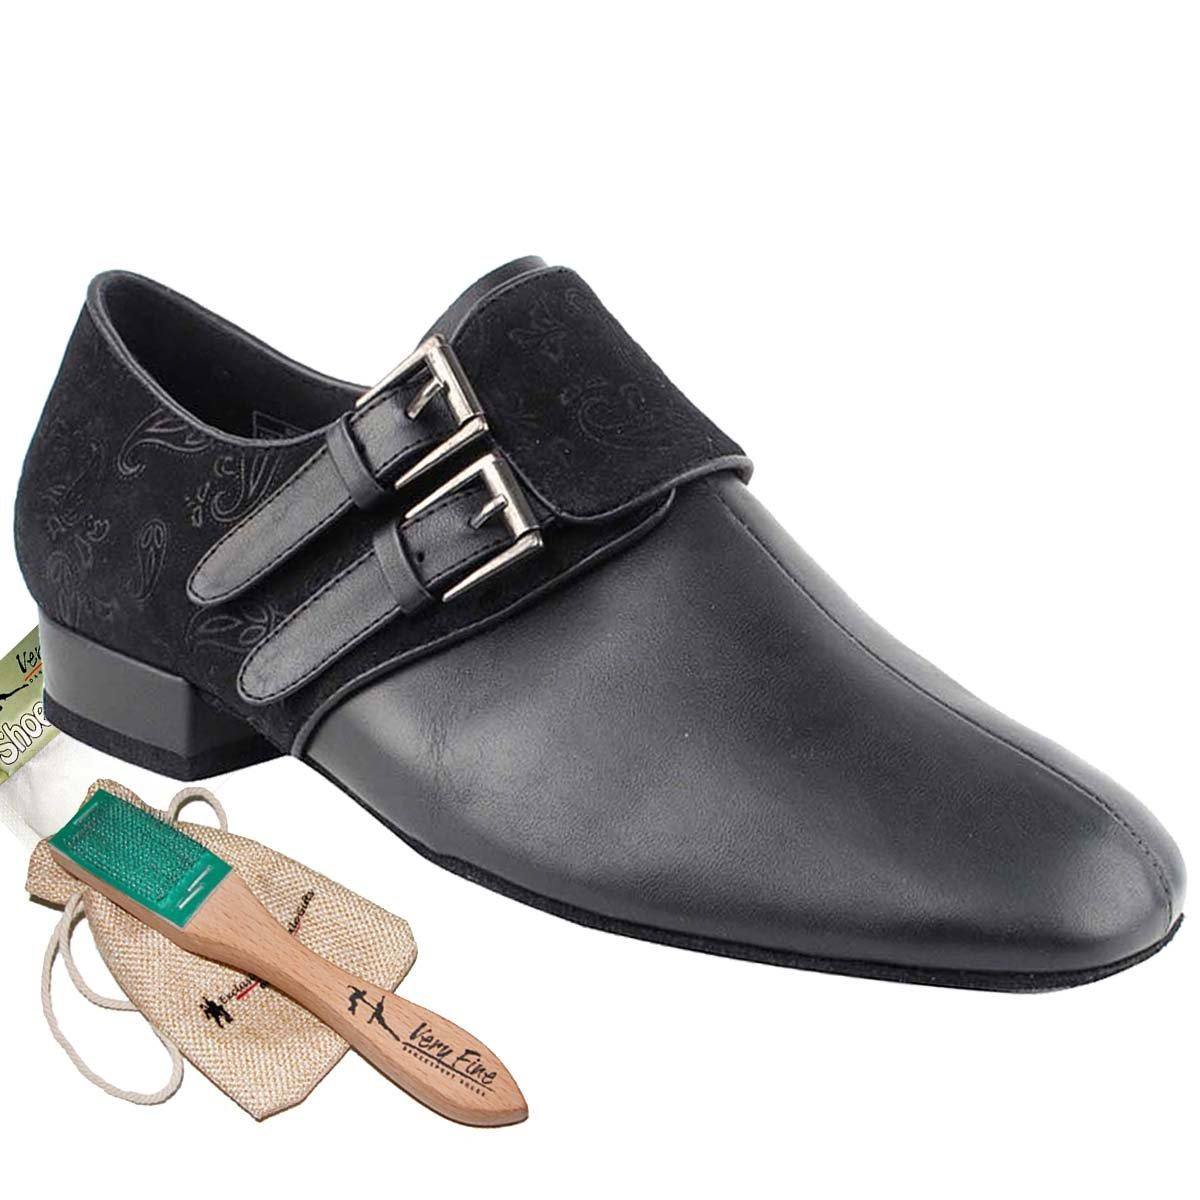 Mens Ballroom Dance Shoes Standard & Smooth Tango Wedding Salsa Shoe CD9006AEB-Very Fine 1